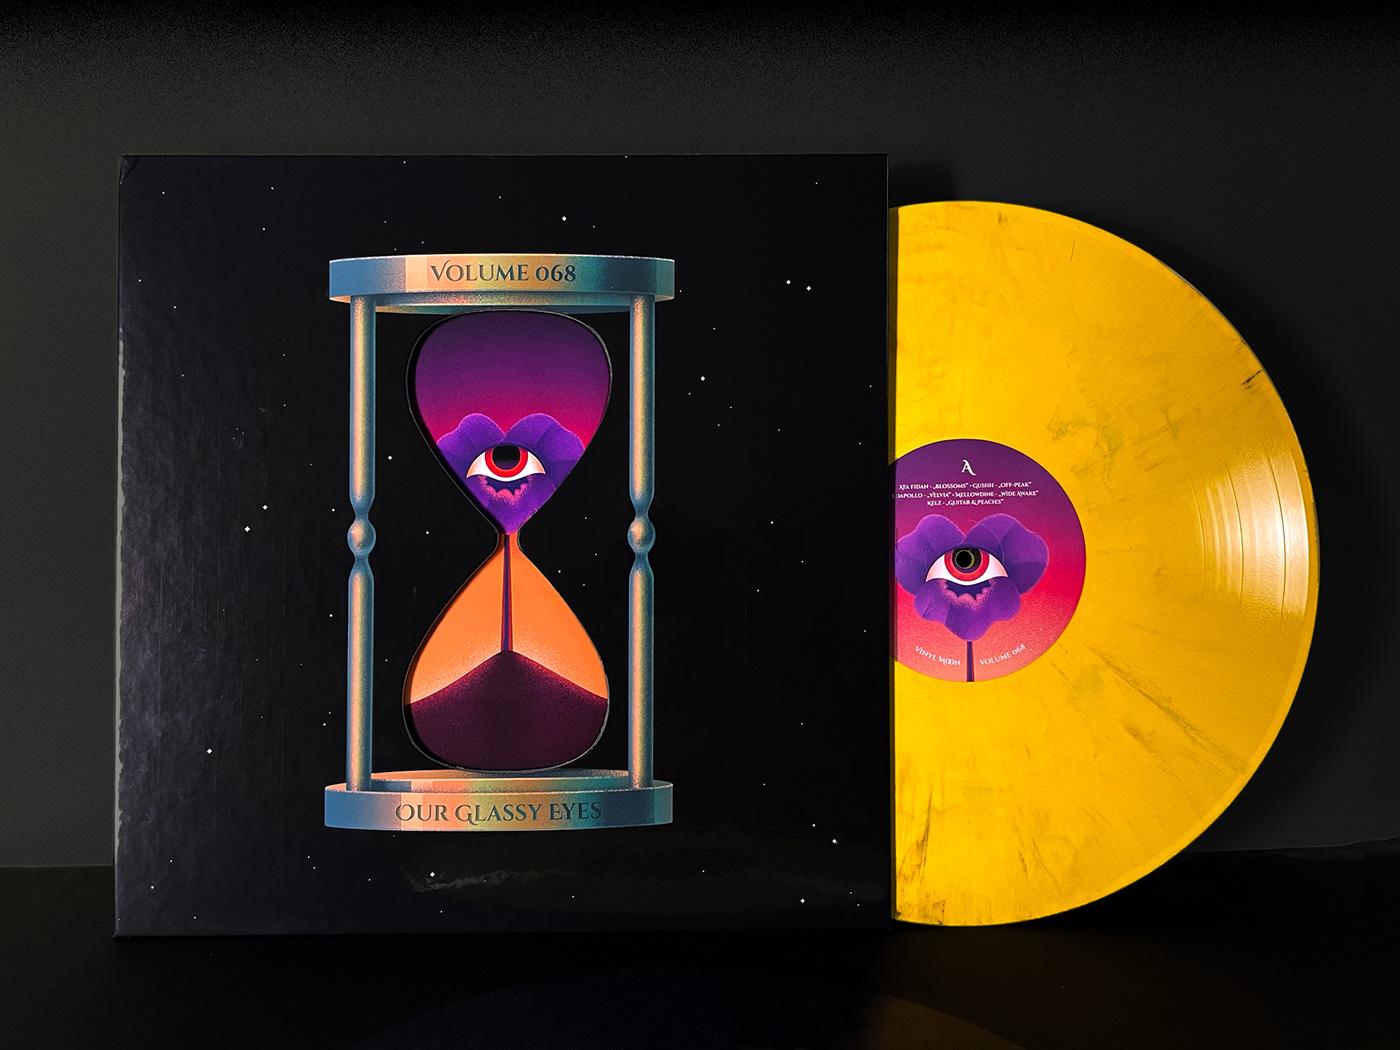 album cover clockwork cover eyes Gear mixtape music surreal vinyl Vinyl Cover